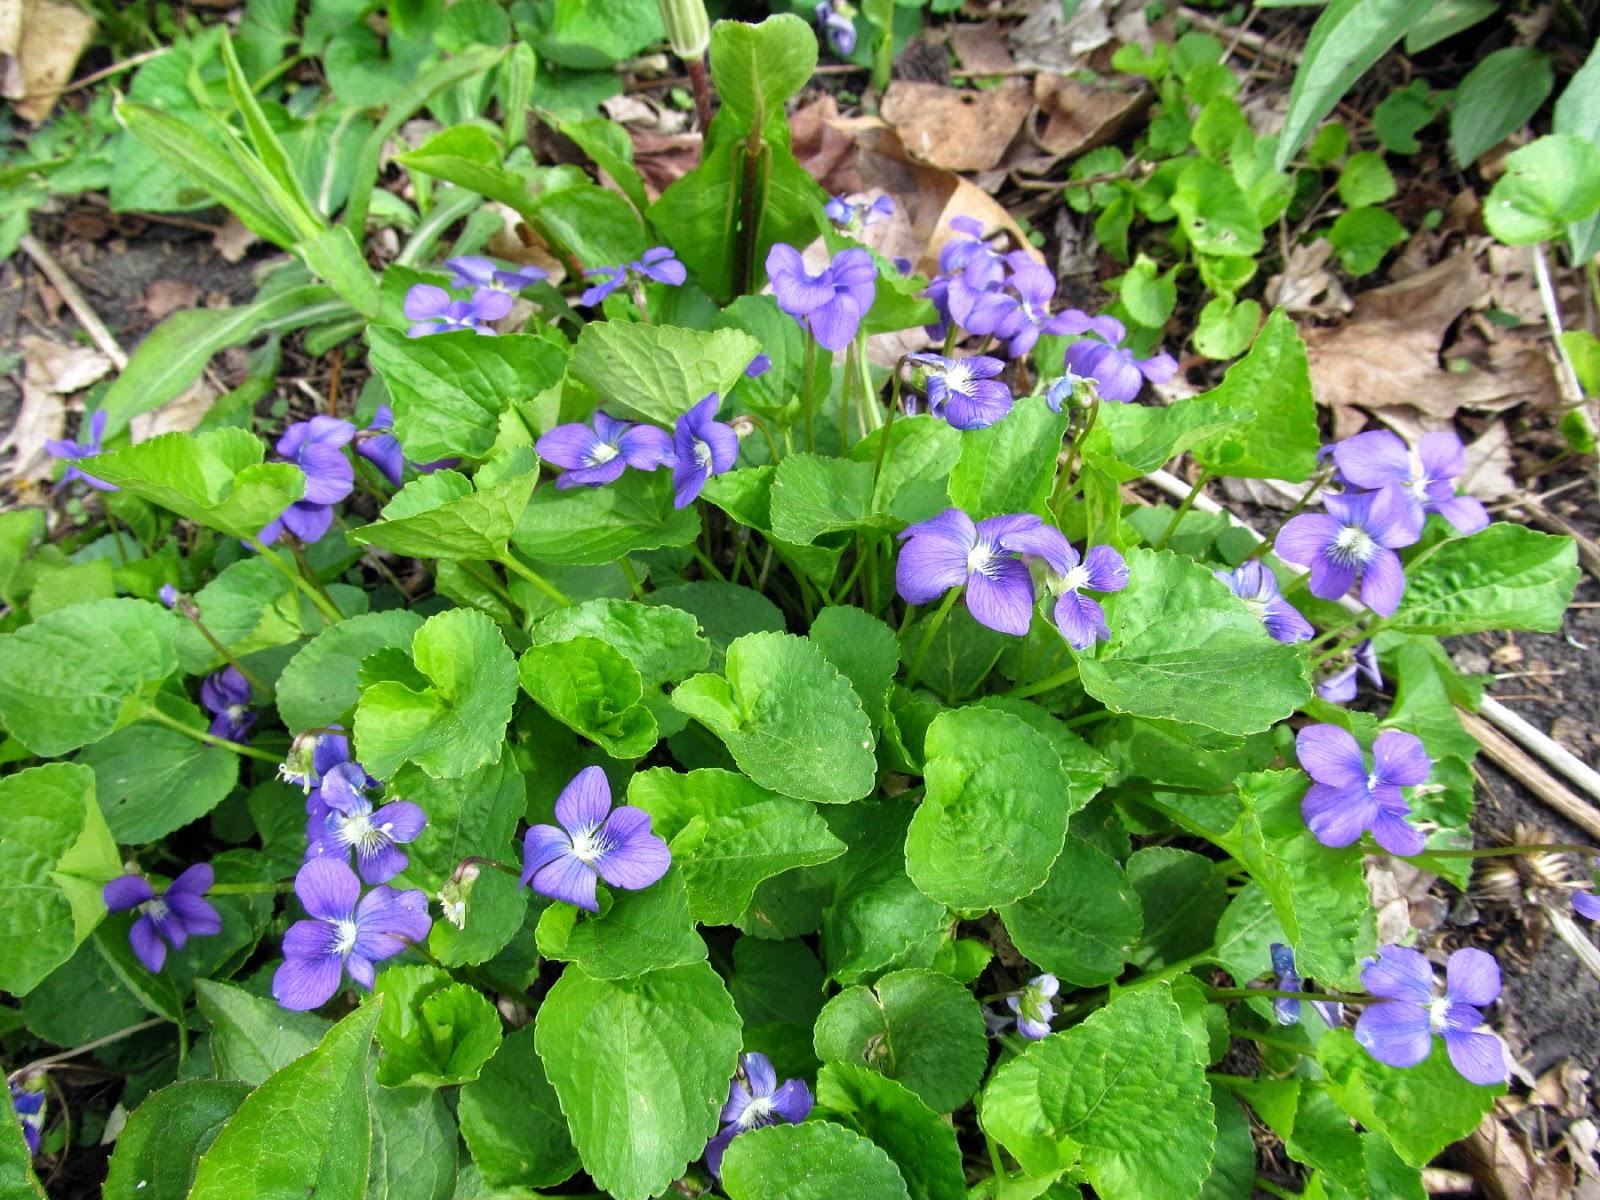 http://4.bp.blogspot.com/-Qive8owsorg/VUROn9YZwyI/AAAAAAAAZi4/As-atuwGyBE/s1600/violets.jpg